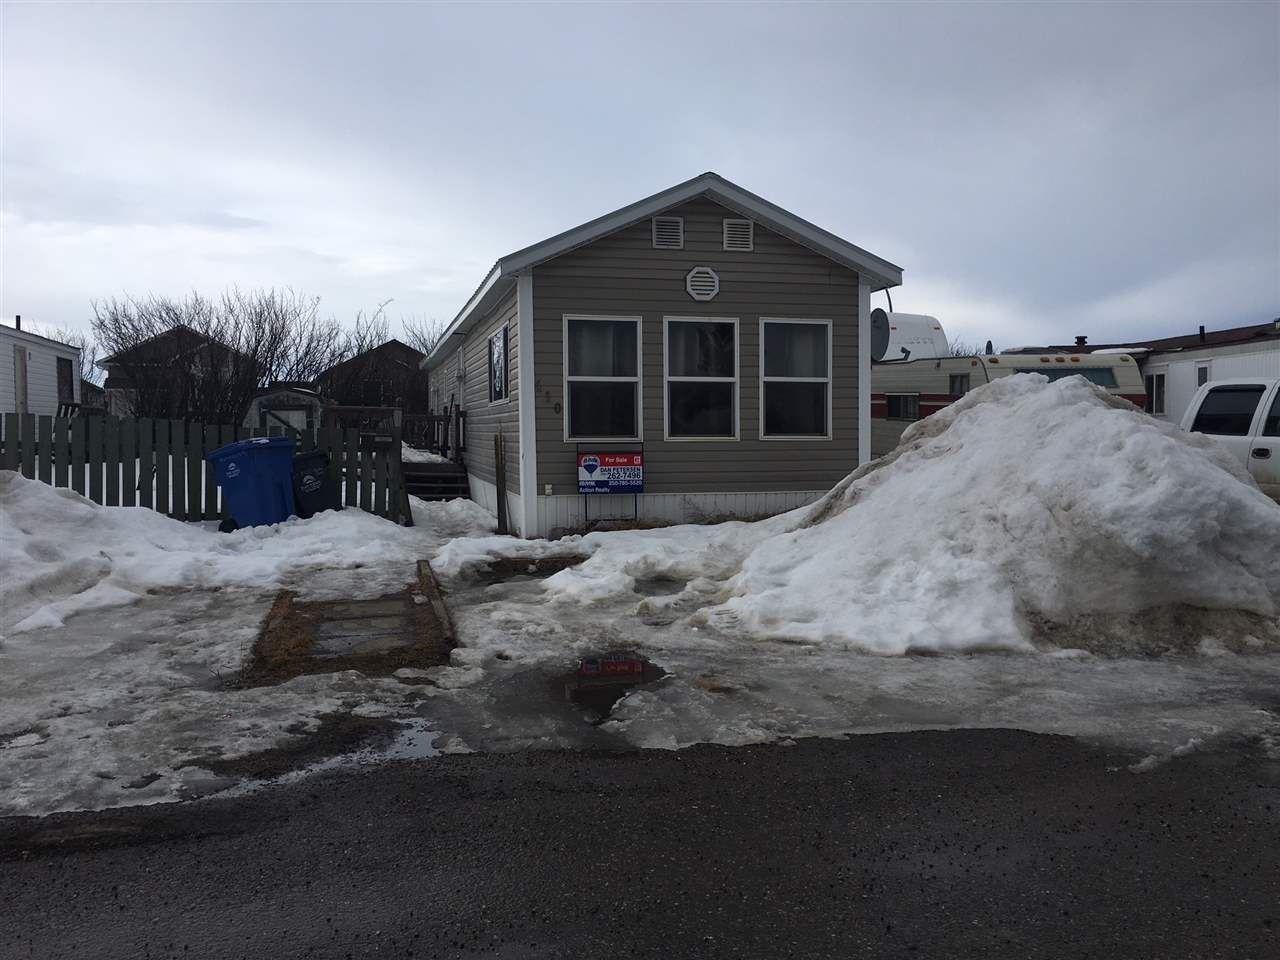 Main Photo: 110 8420 ALASKA Road in Fort St. John: Fort St. John - City SE Manufactured Home for sale (Fort St. John (Zone 60))  : MLS®# R2330389